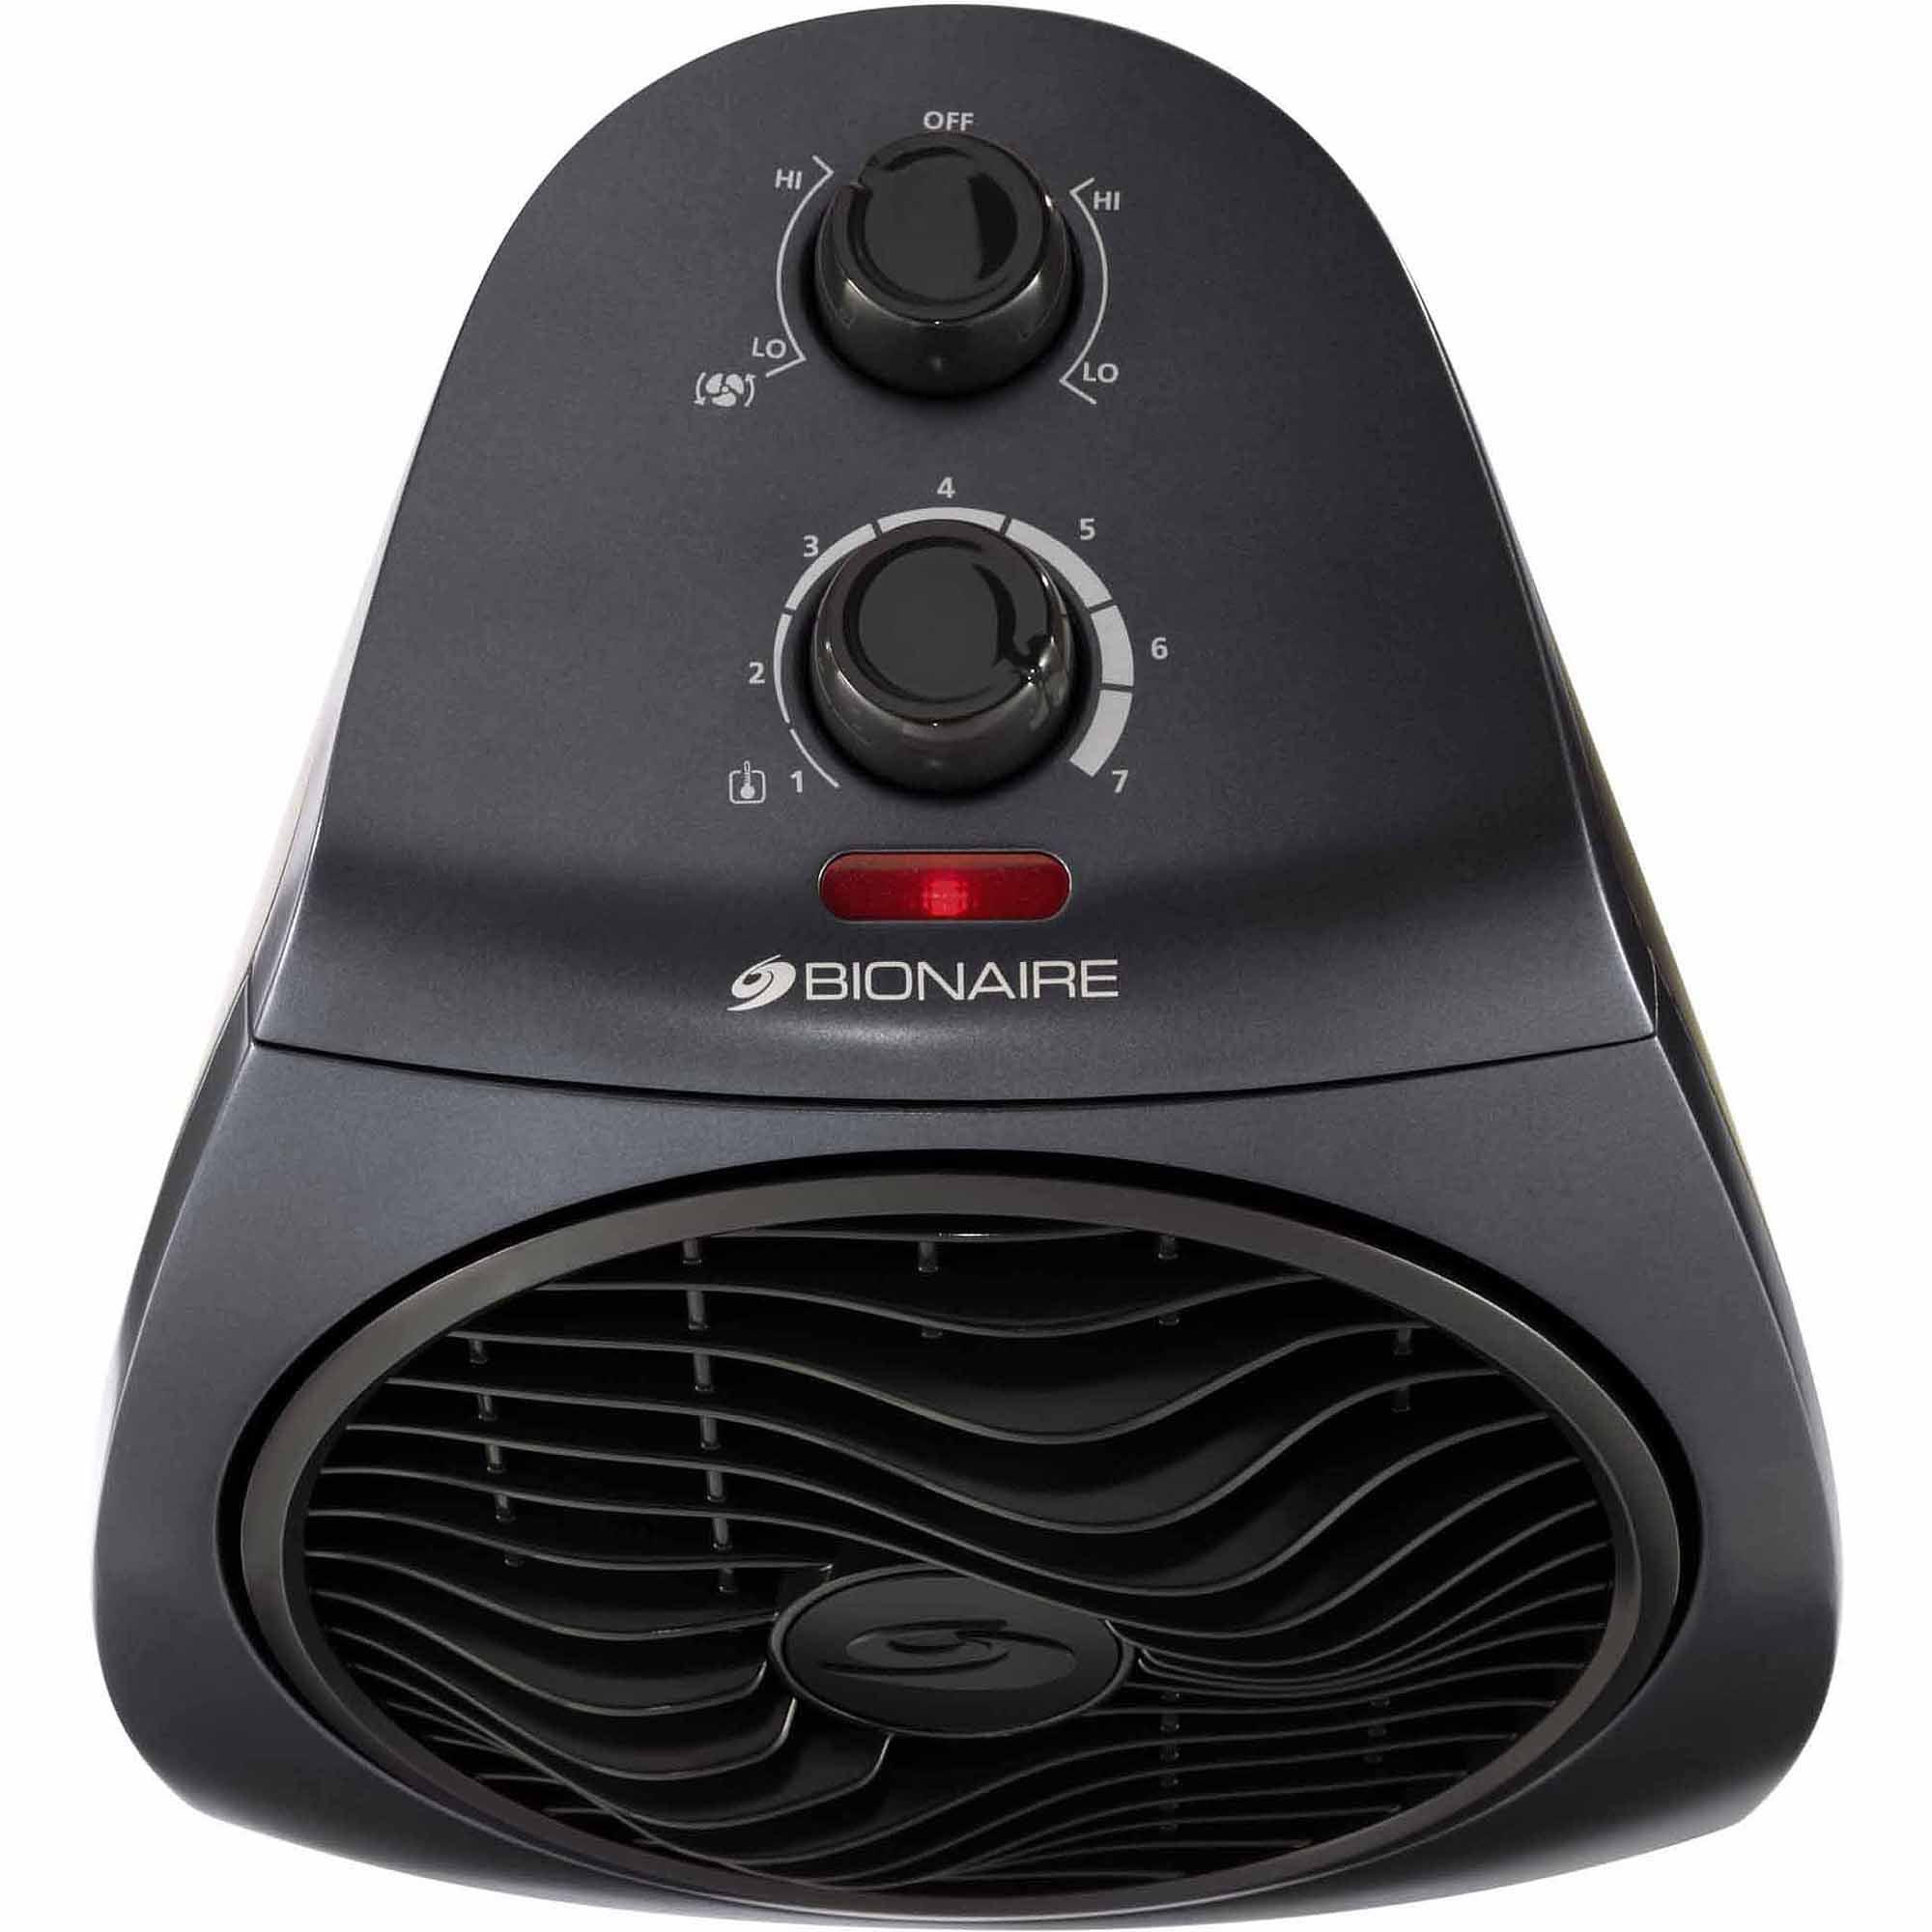 4285d03fa637 Bionaire Electric Heater Fan Circulator with Rotating Grill  (BFH3342M-UWM-115) - Walmart.com